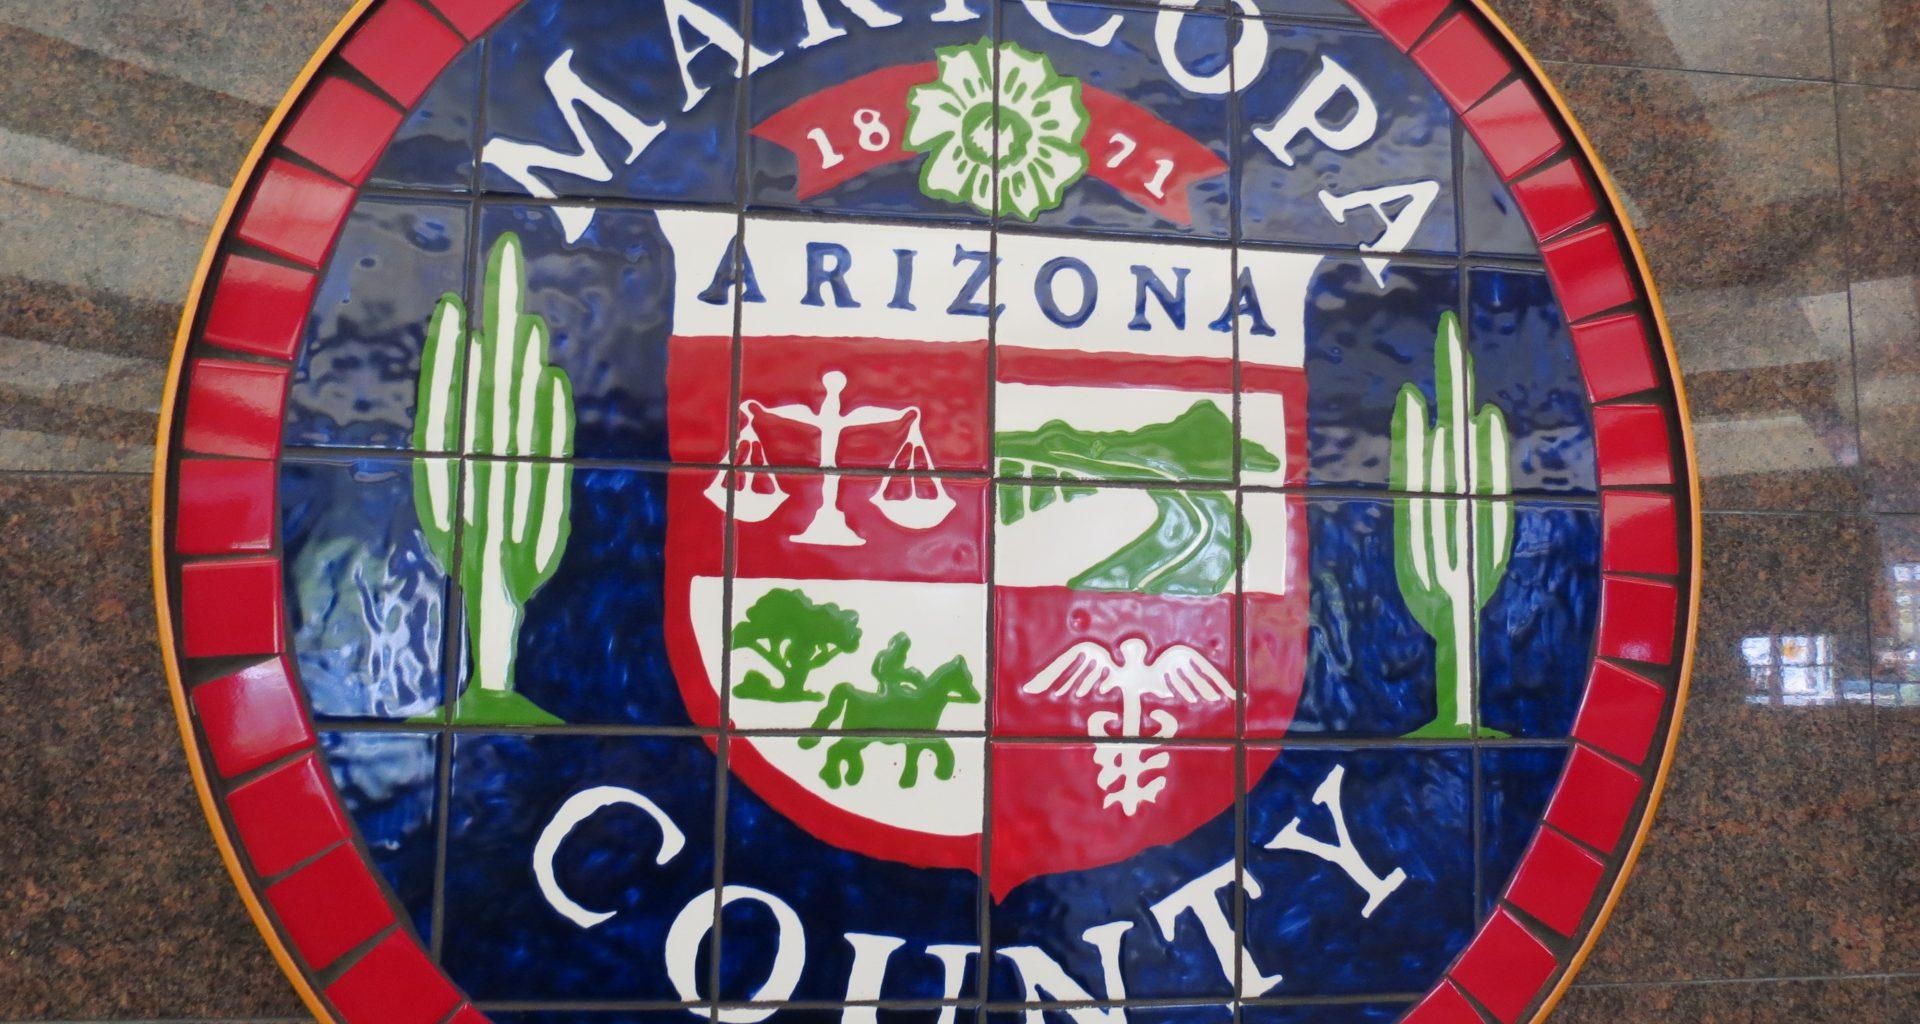 Maricopa County Has Been Notified